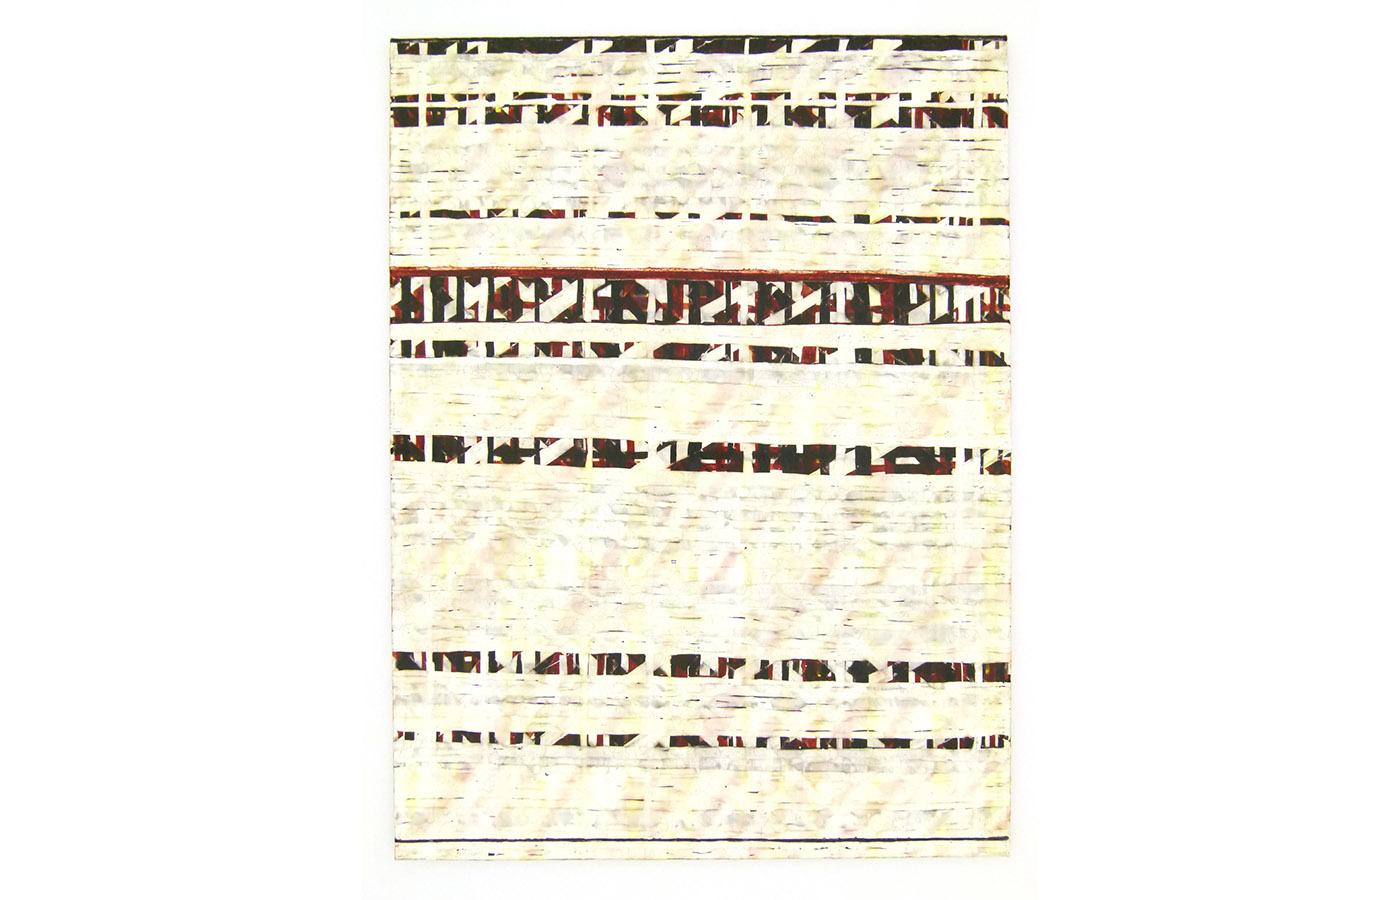 Linienbilder 4_0001_L1150014a